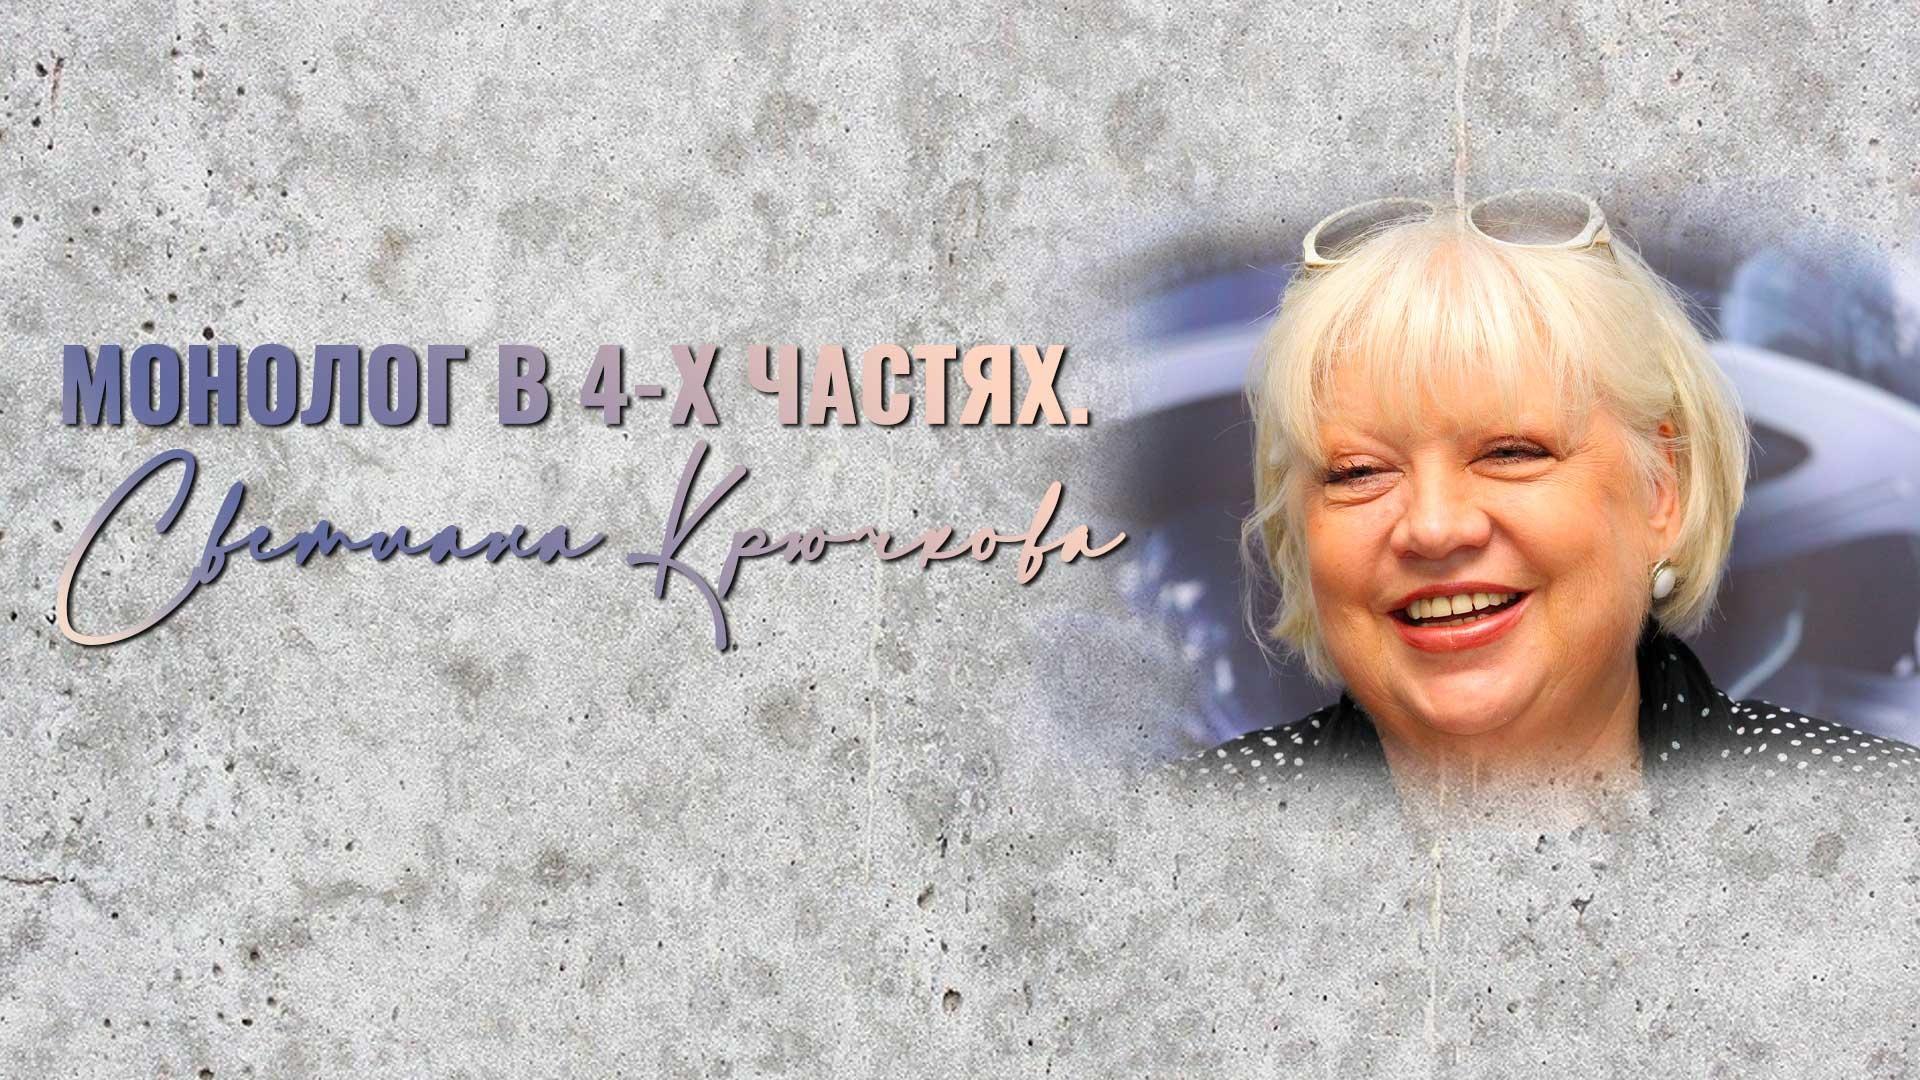 Монолог в 4-х частях. Светлана Крючкова